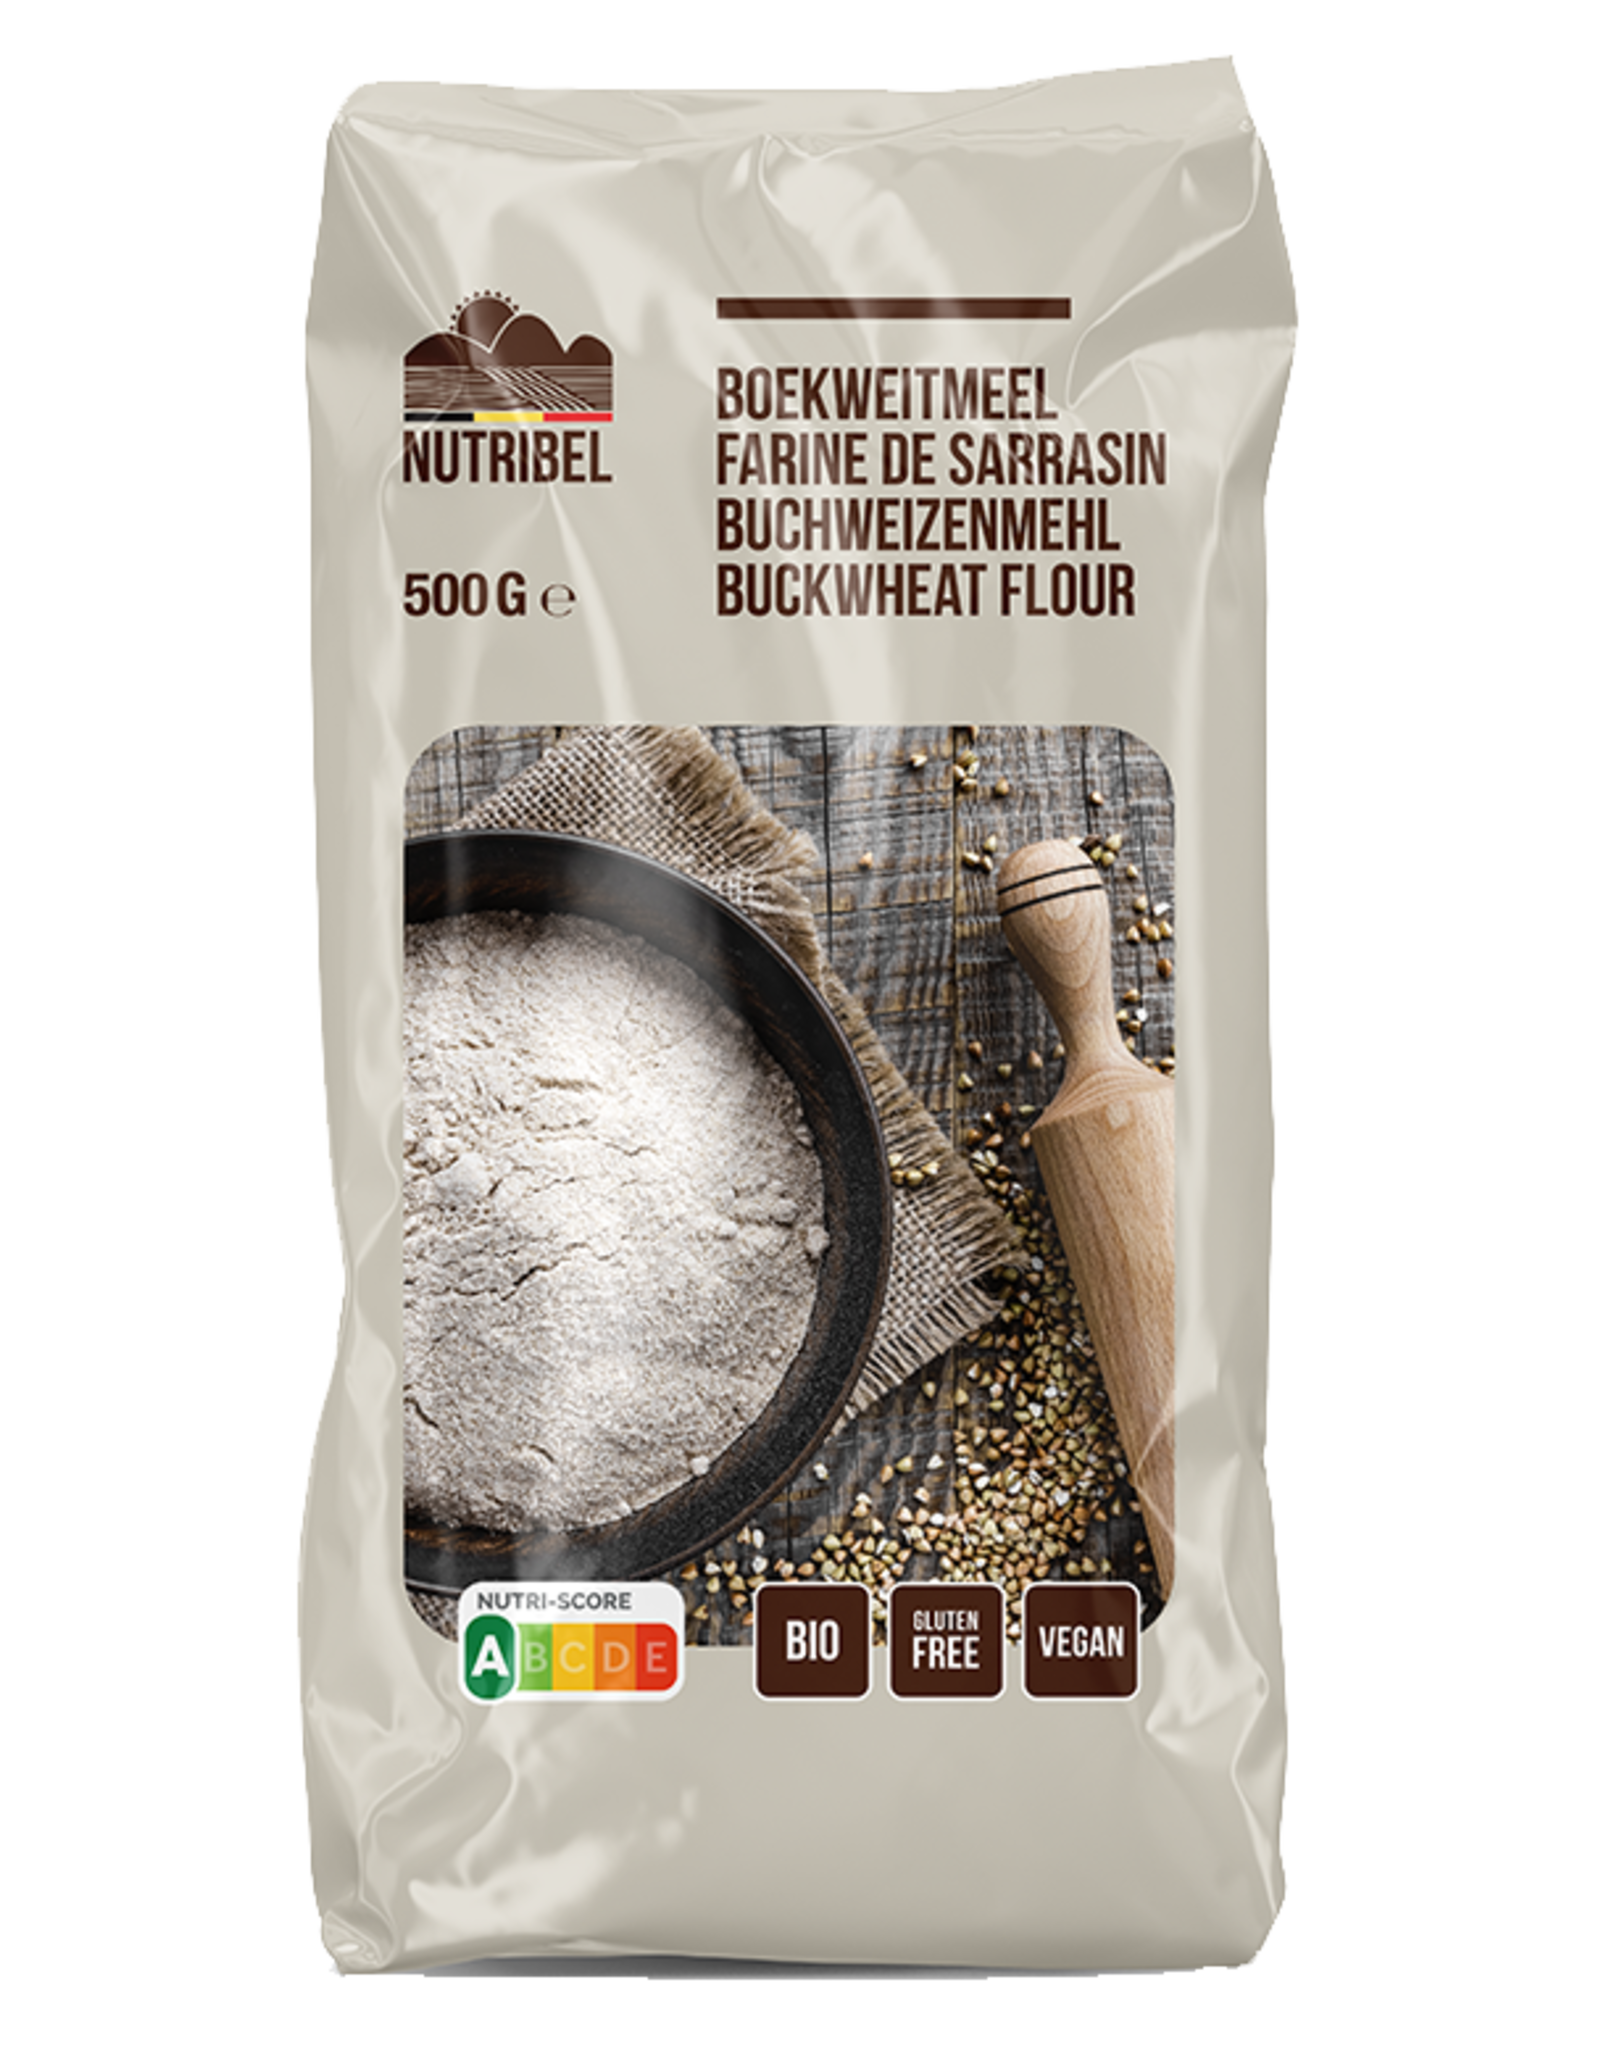 Nutribel Boekweitmeel bio & glutenvrij 500g